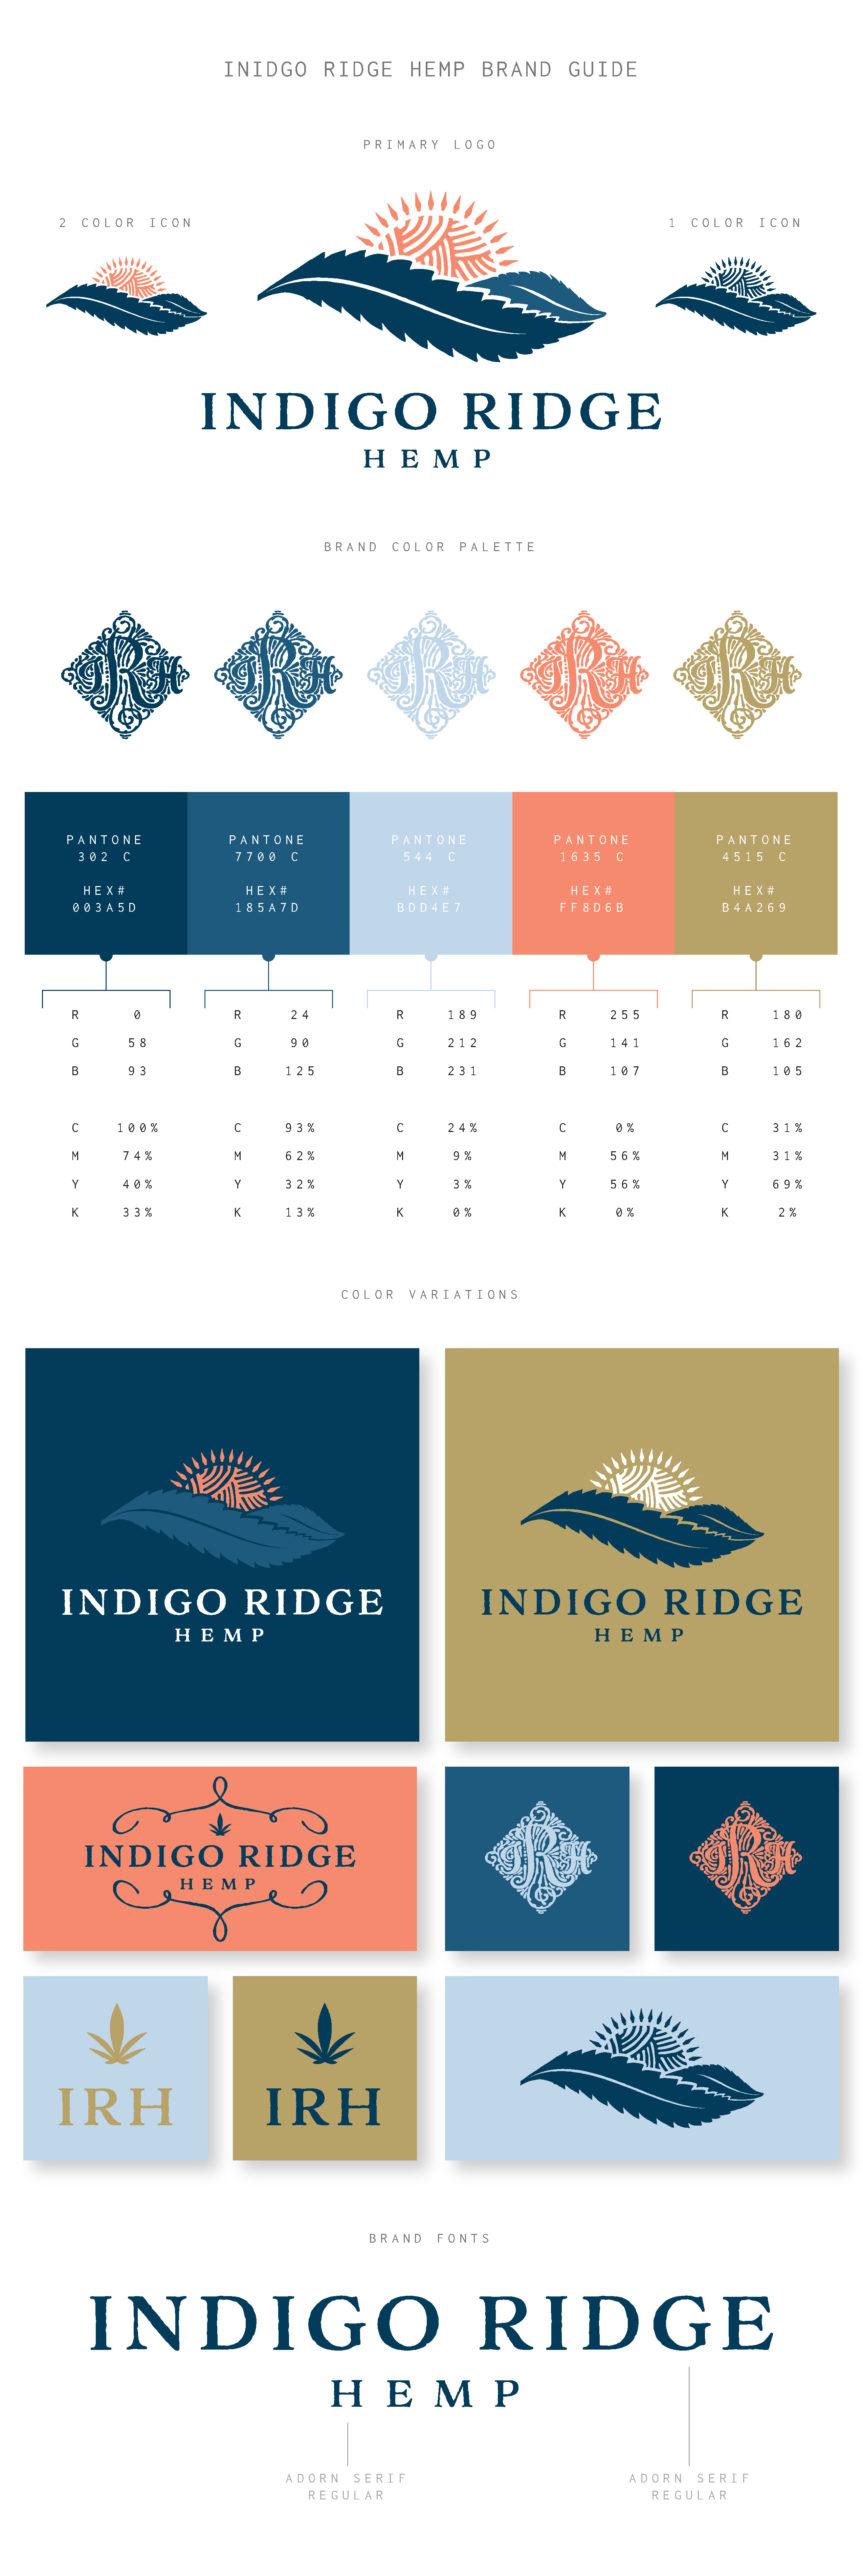 Indigo Ridge Hemp Brand Guide